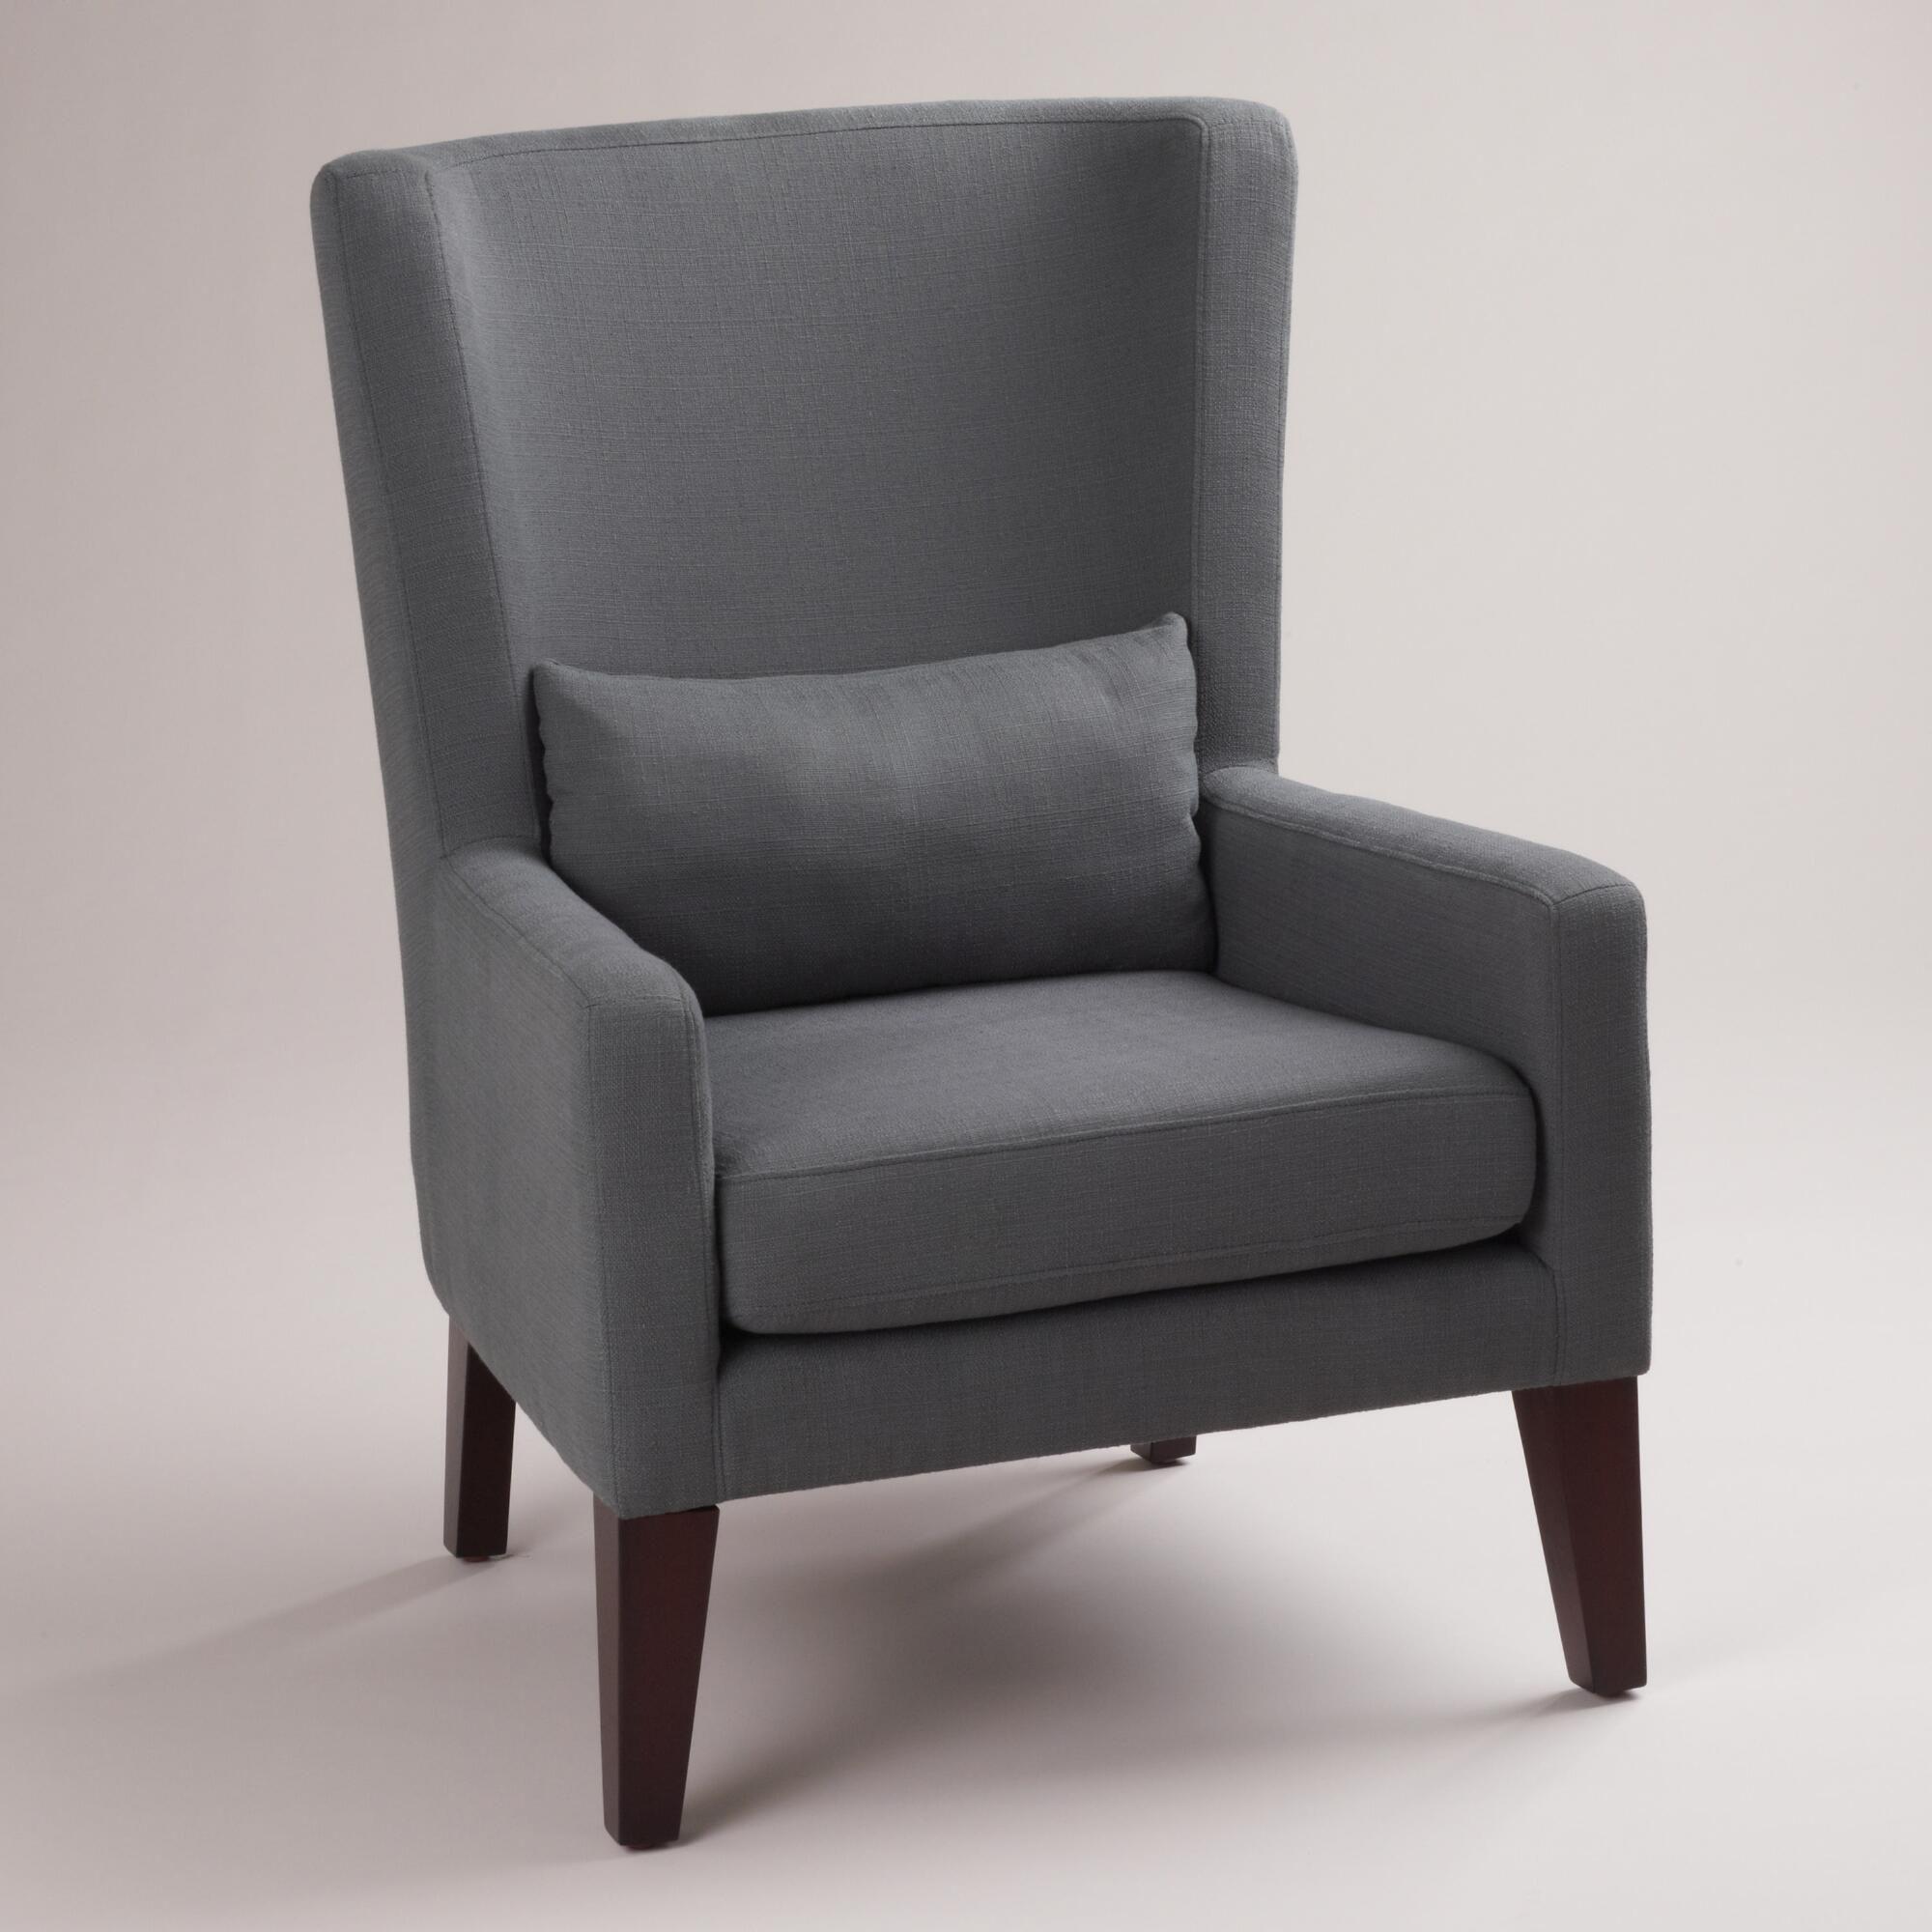 Dove Gray Triton High Back Chair High back chairs